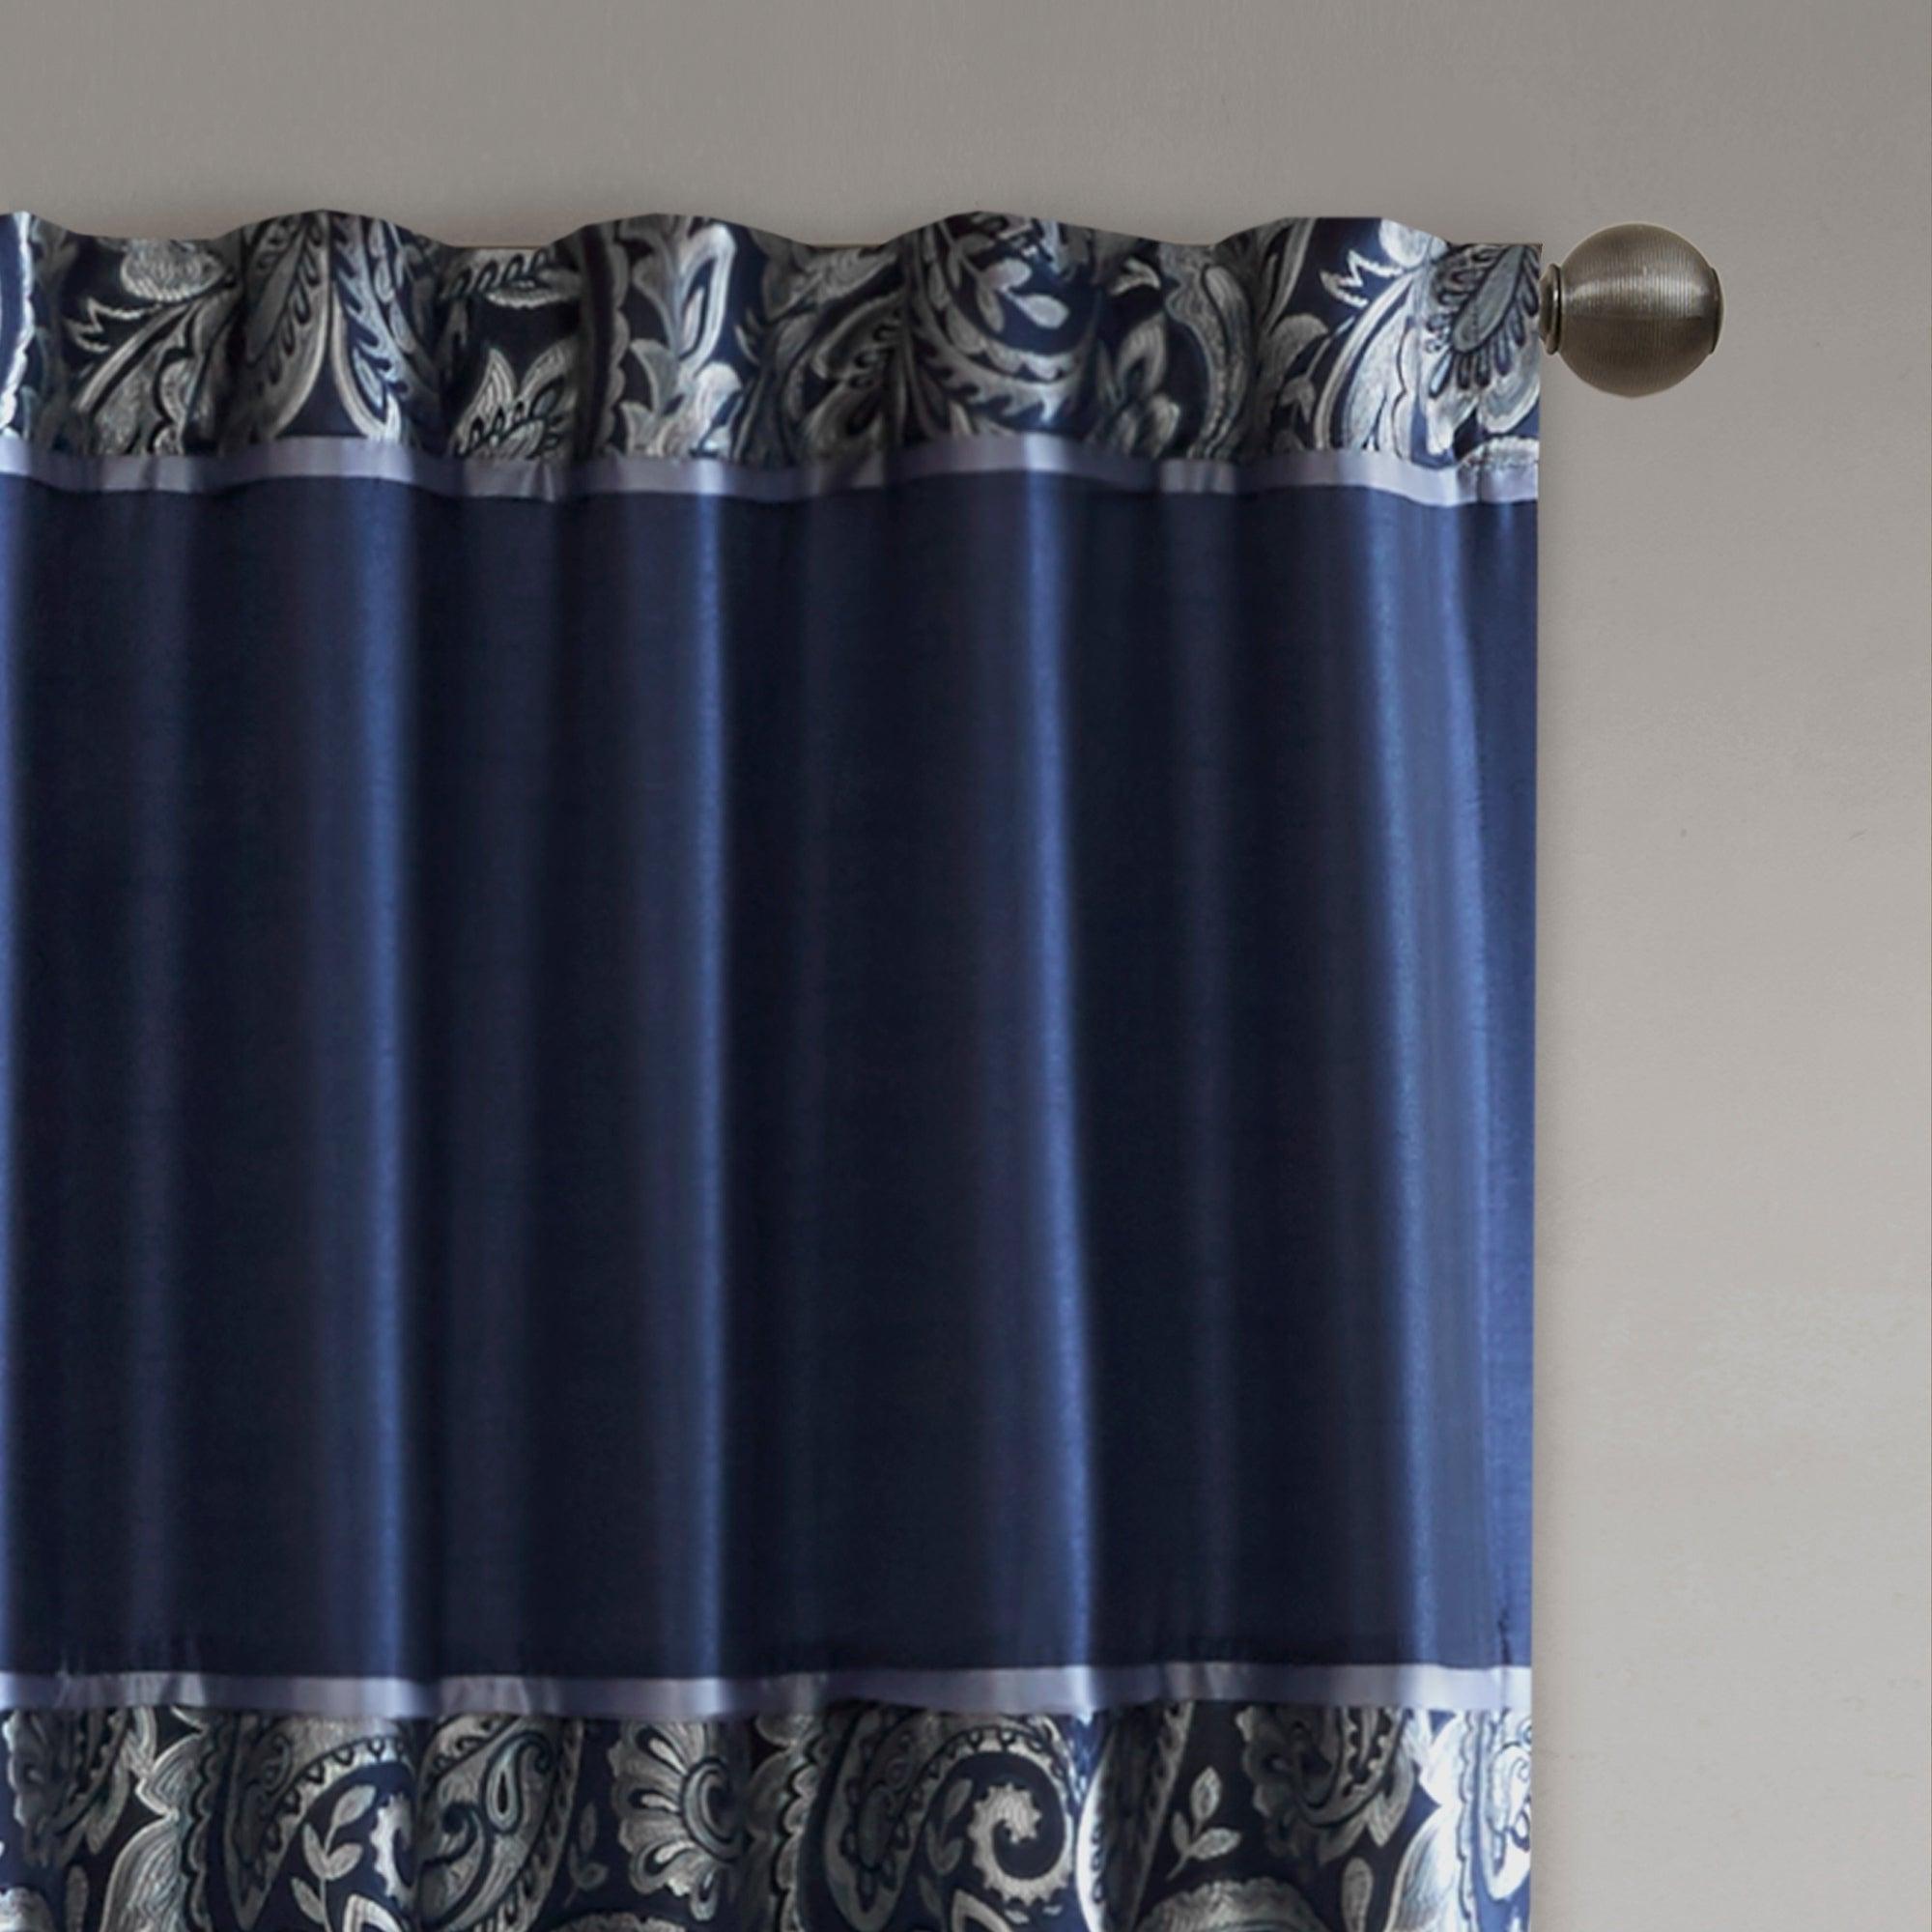 Madison Park Whitman Curtain Panel Pair Within Favorite Whitman Curtain Panel Pairs (View 9 of 20)